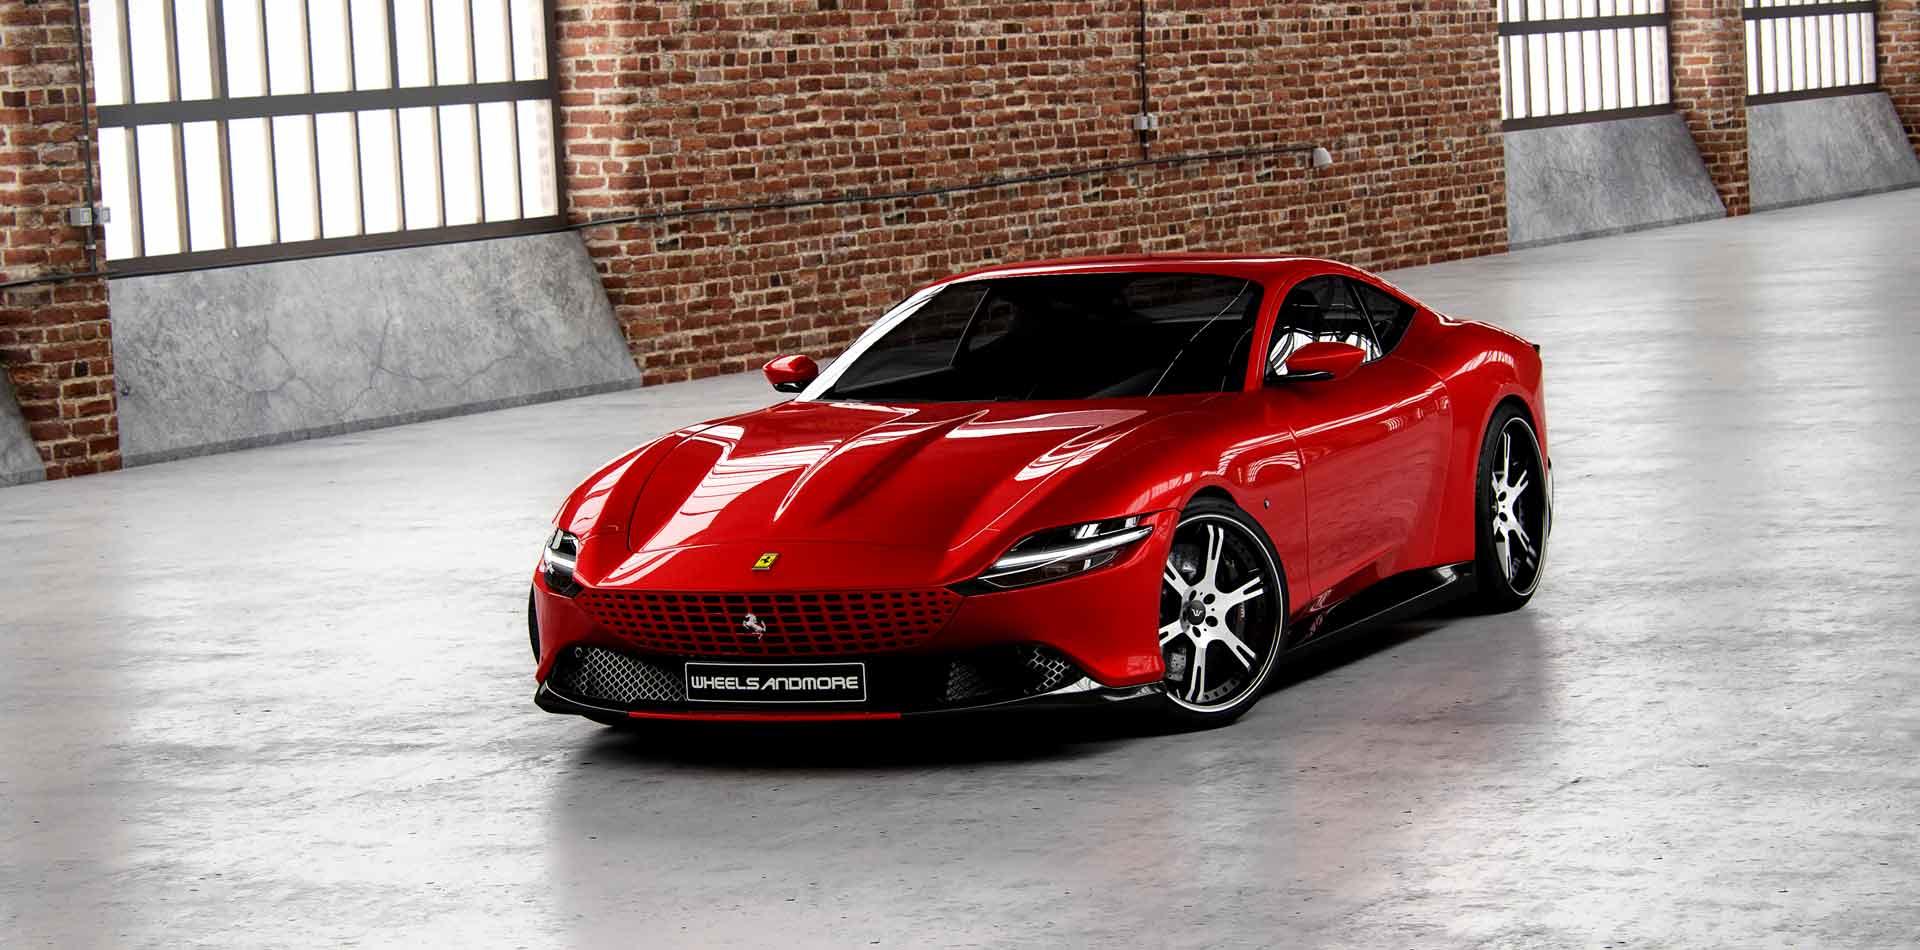 Wheelsandmore Veredelt Neuen Ferrari Roma Eurotuner News